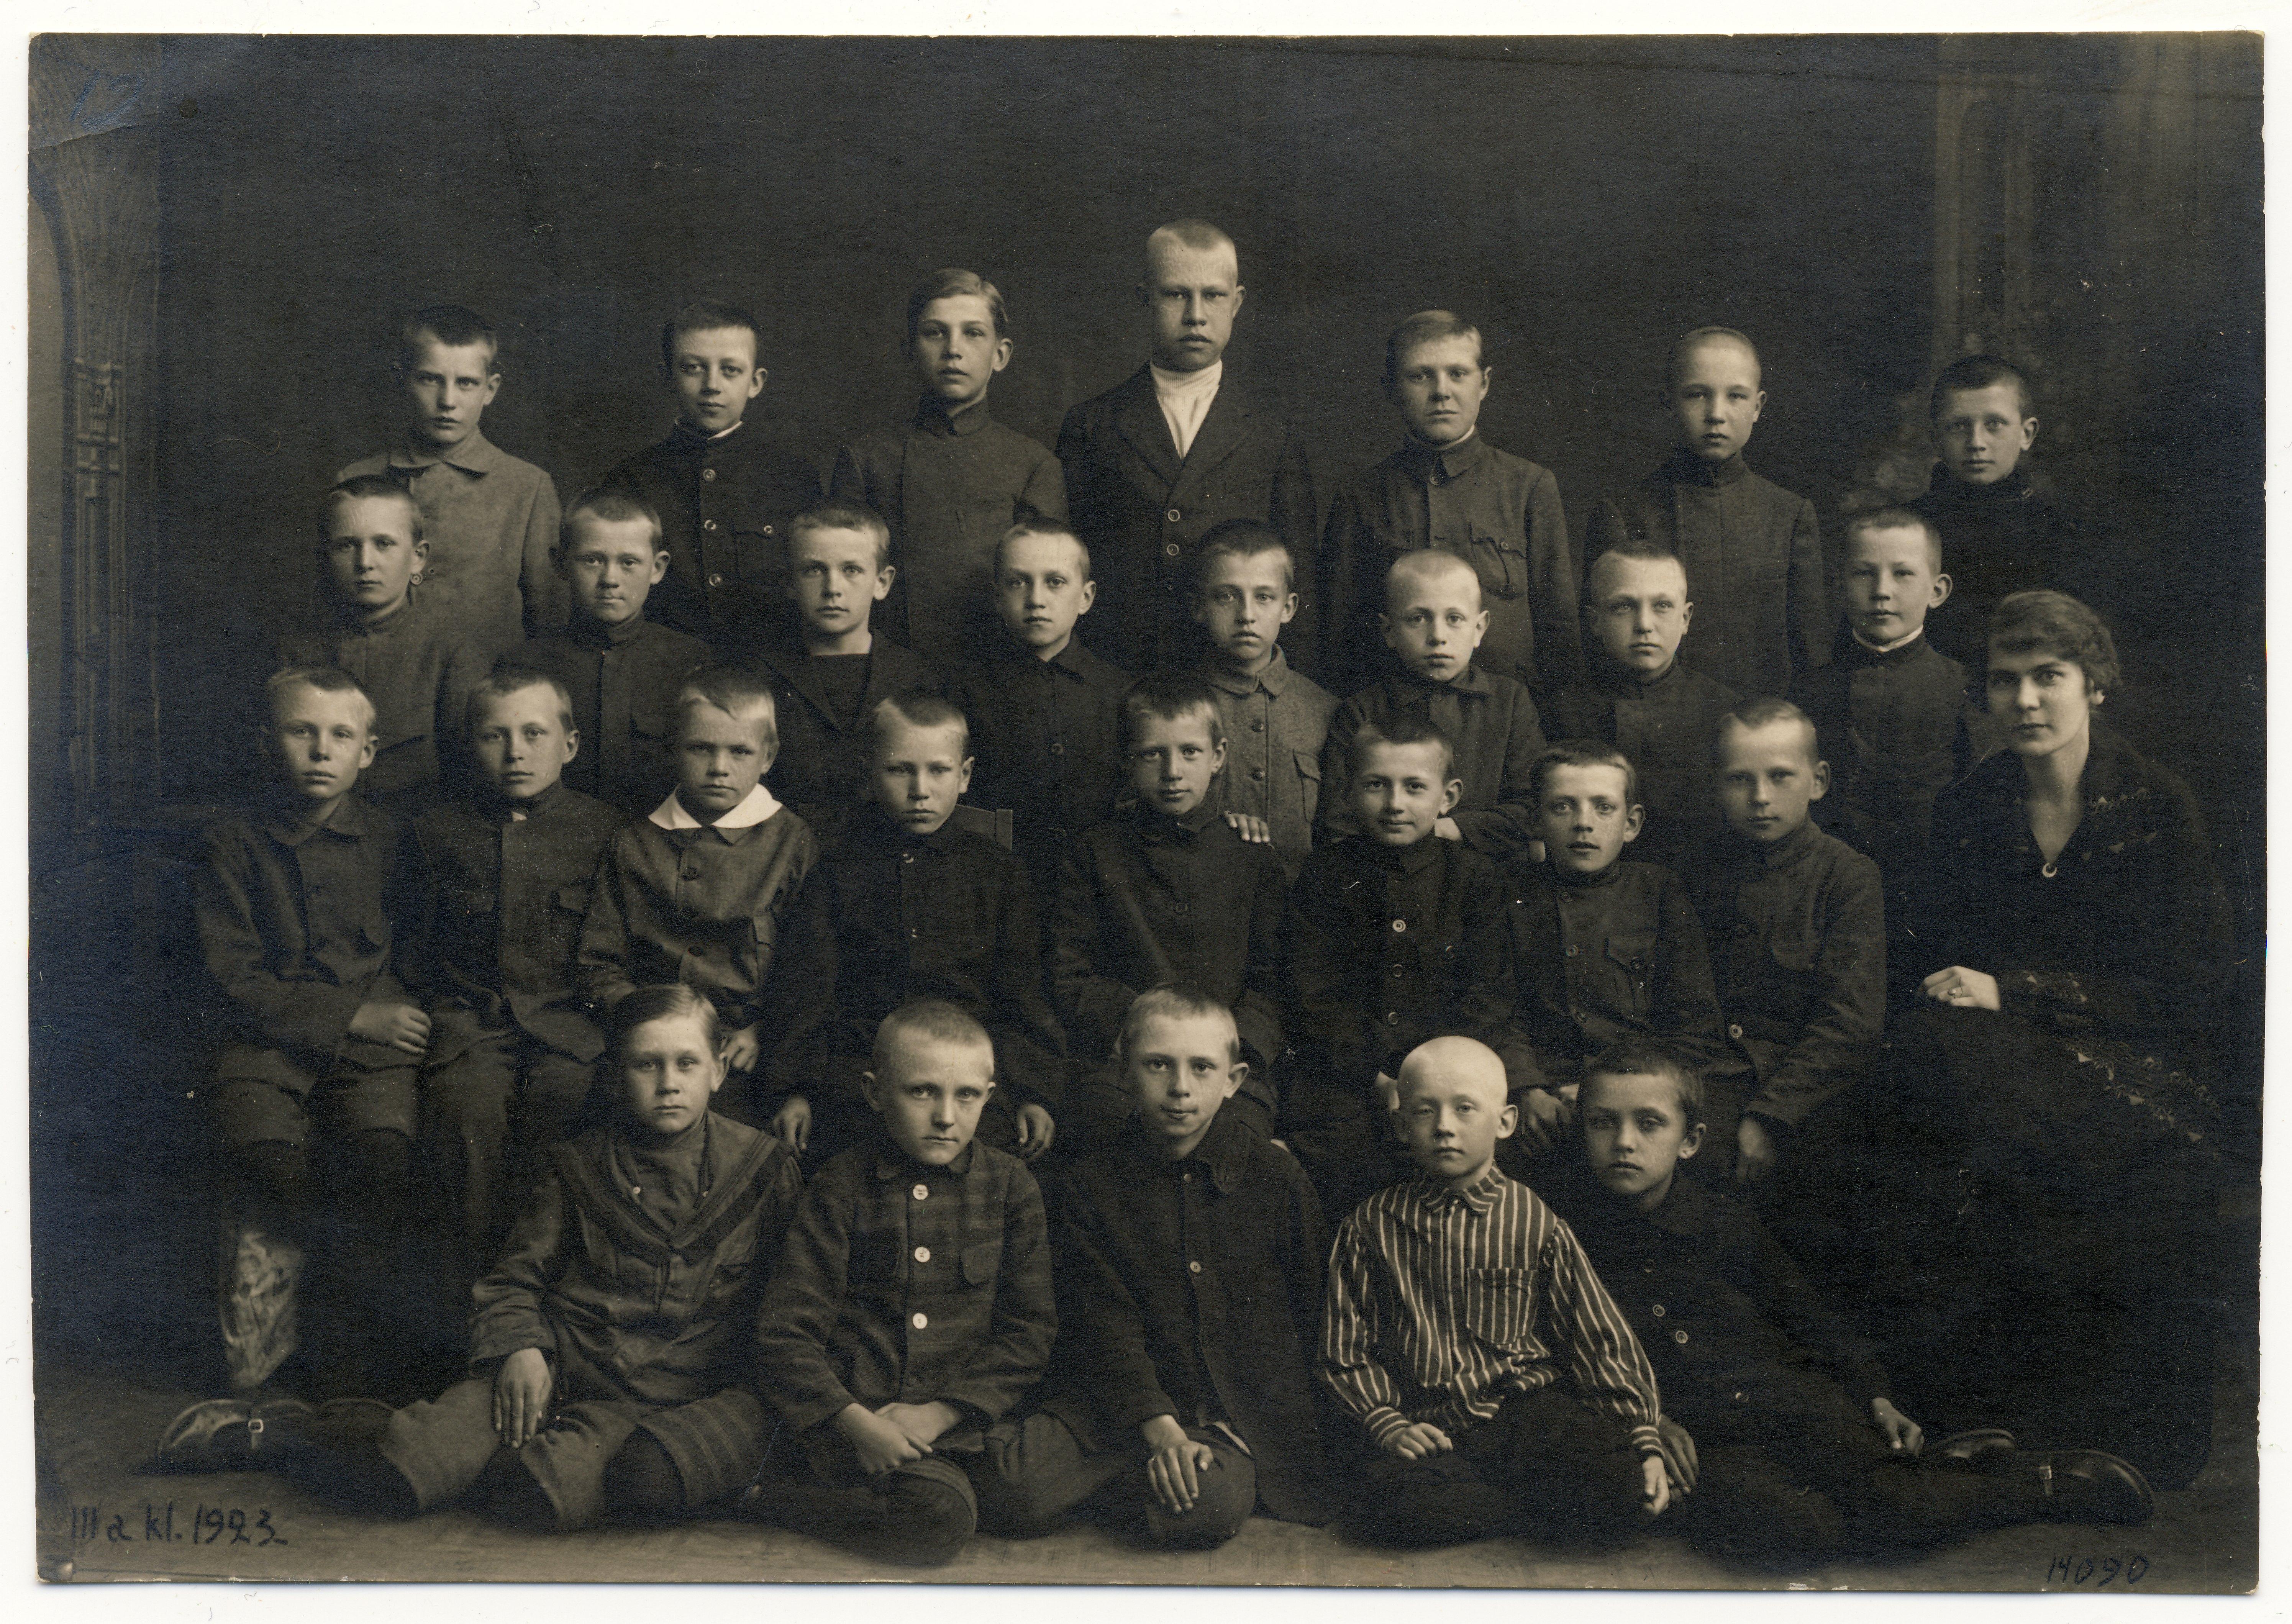 Raimond Valgre Rapla algkooli kolmanda klassi õpilasena, 1923. Esimene rida, paremalt esimene.